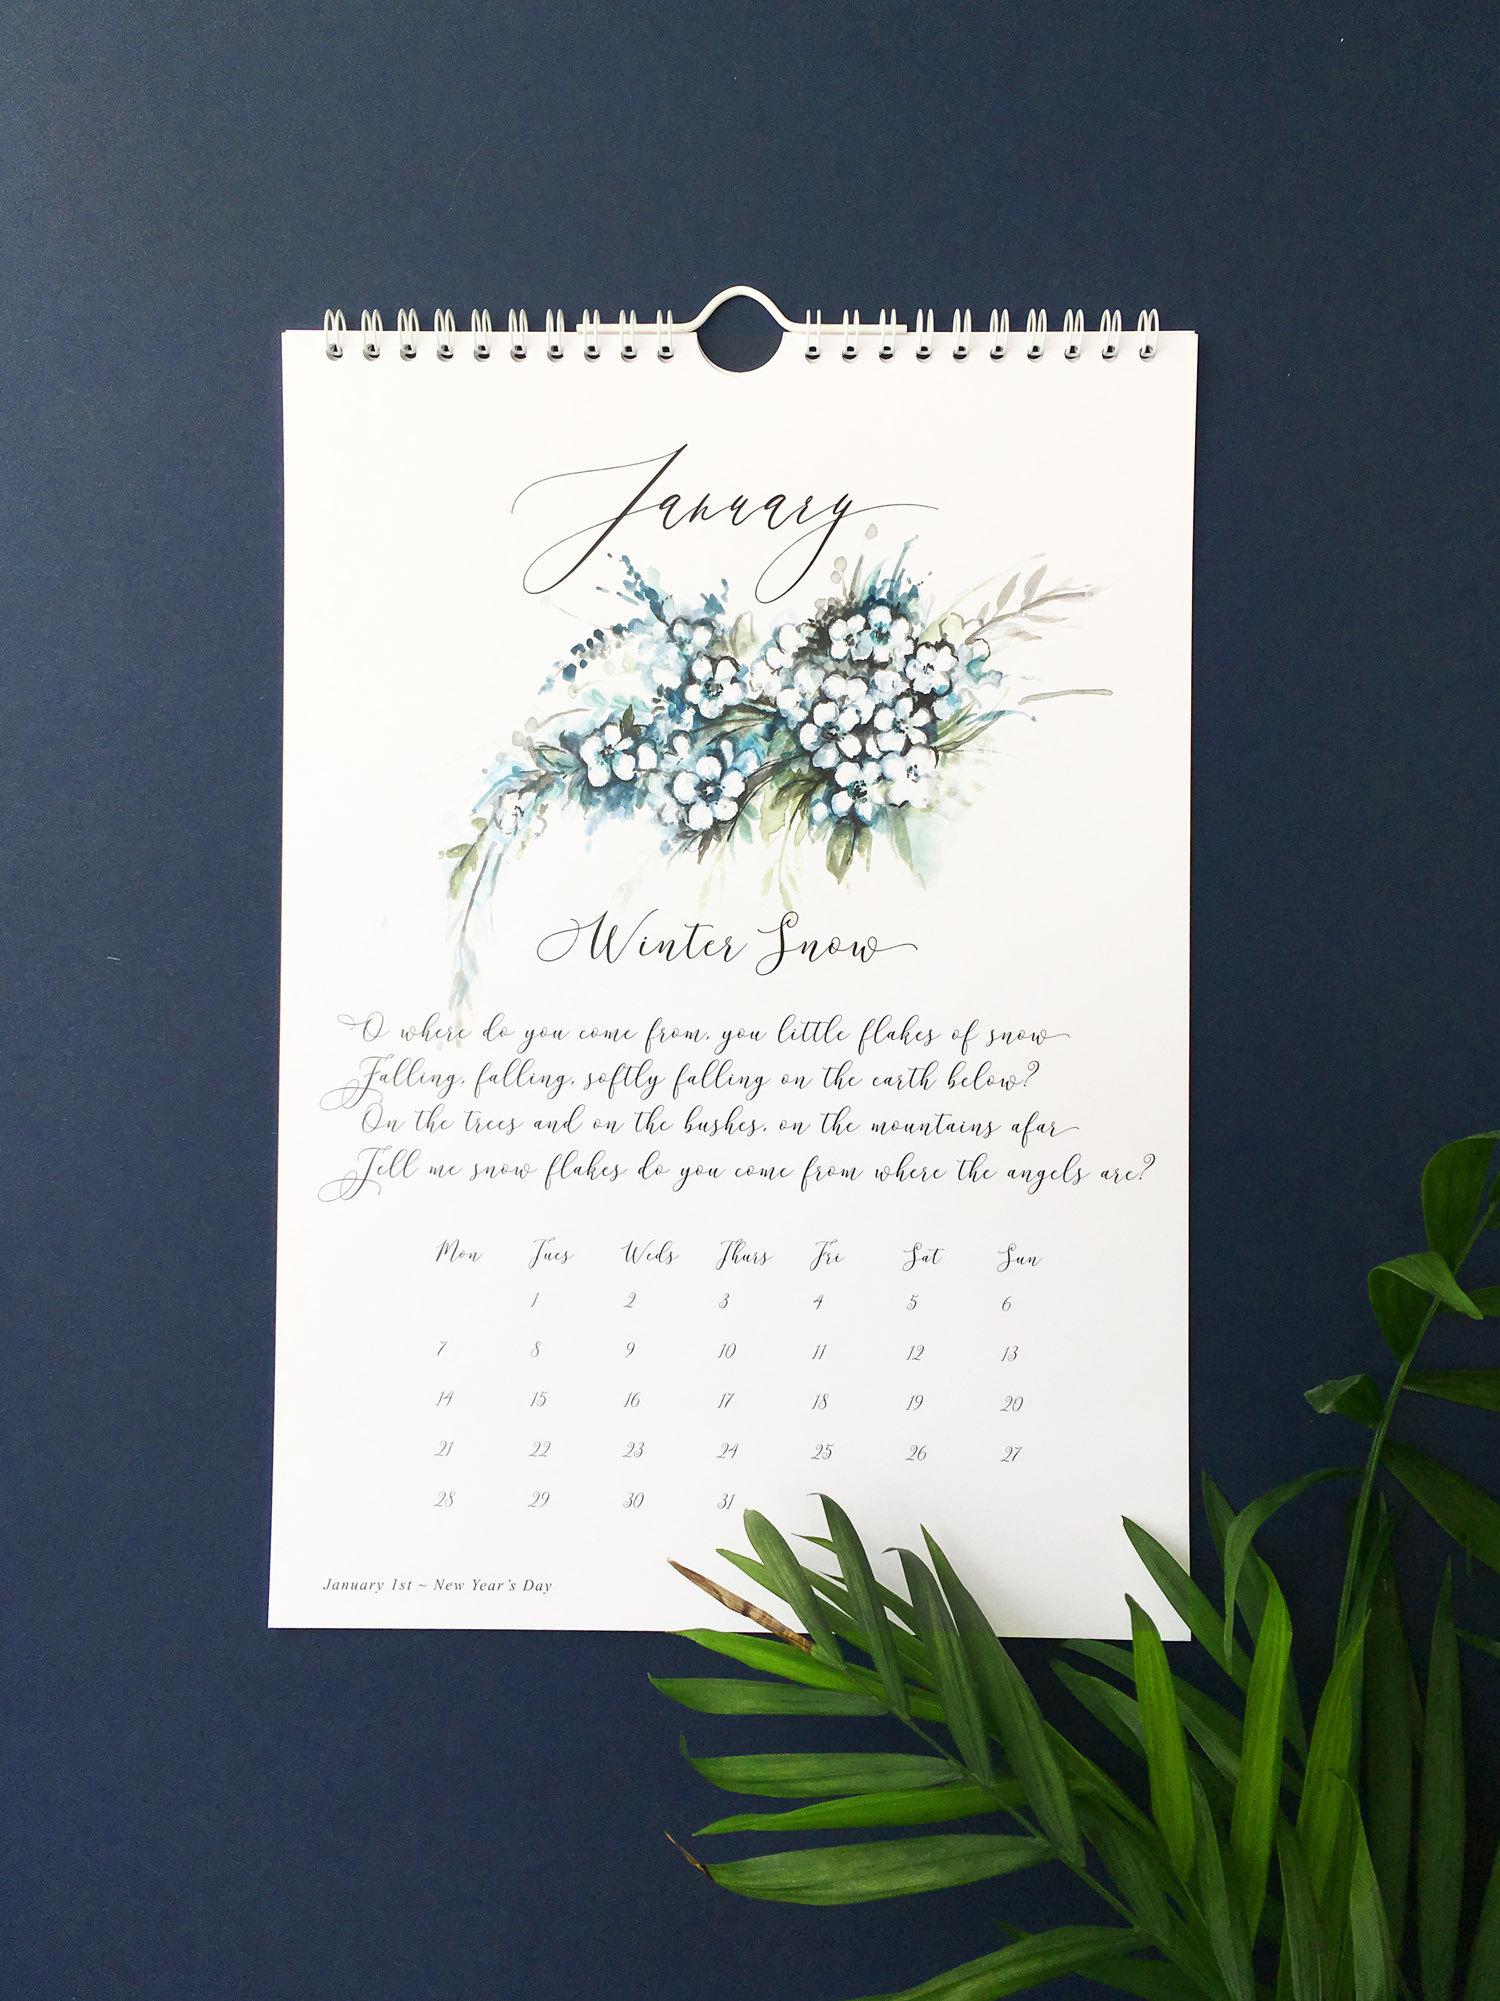 2019 floral wall calendar